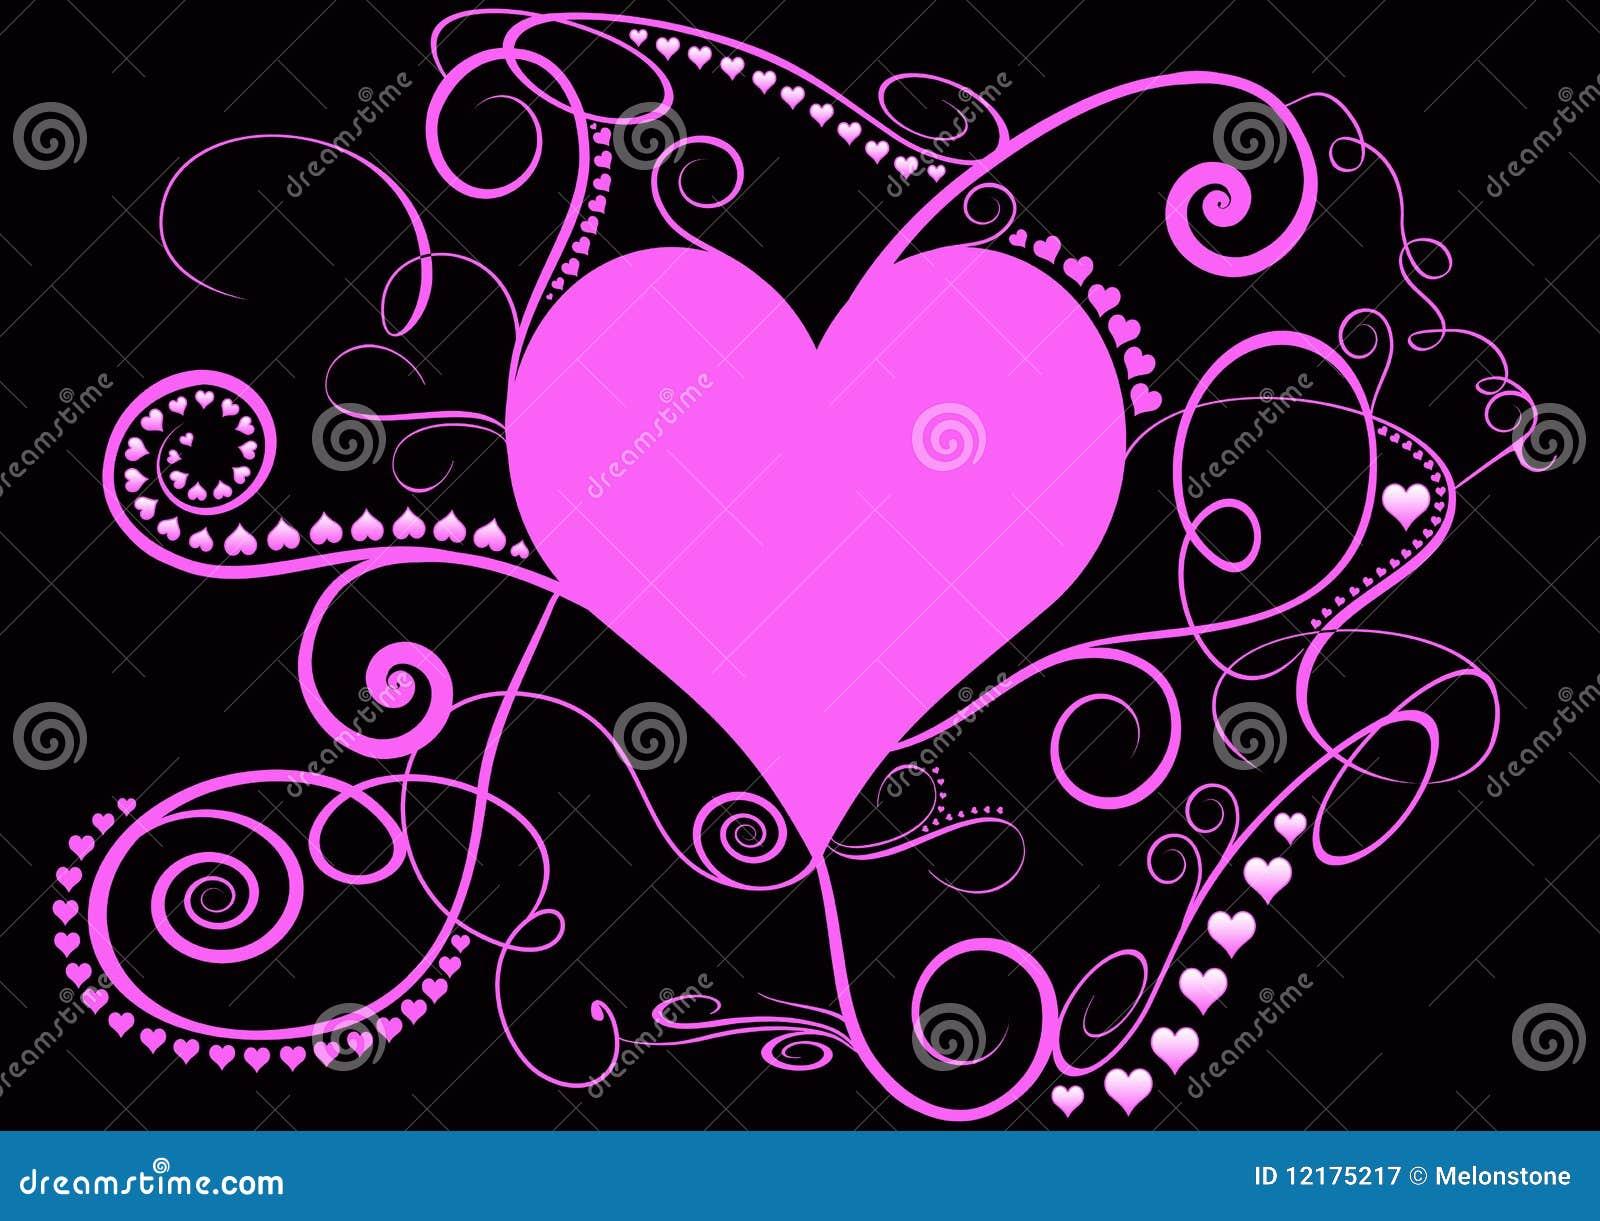 pretty heart designs wallpapers - photo #40